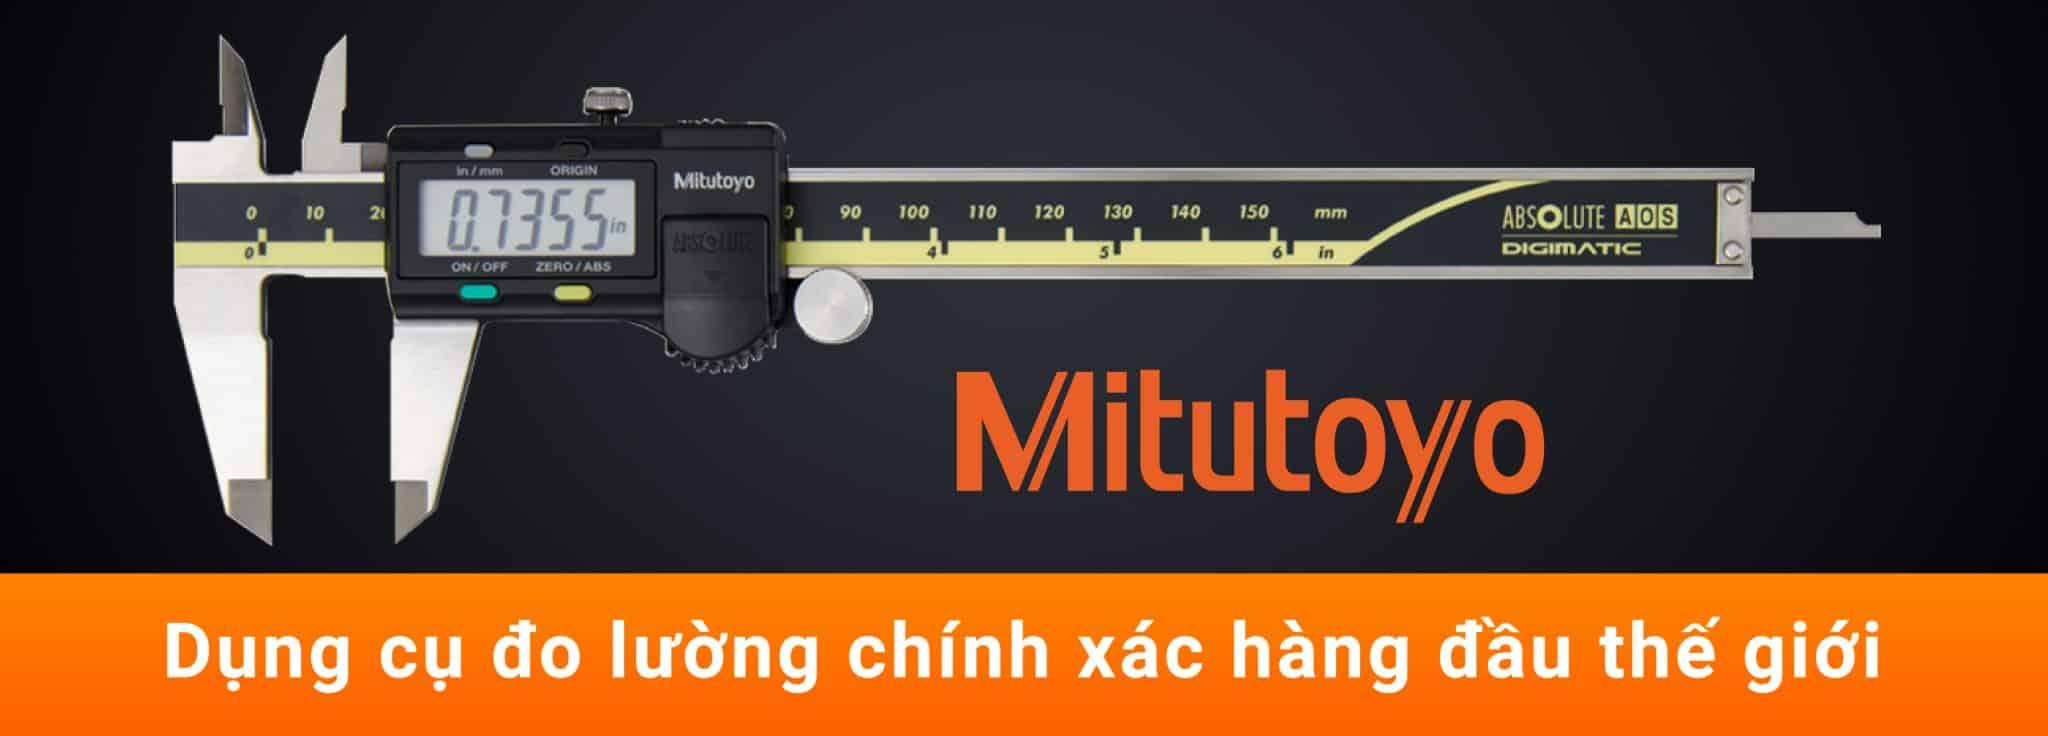 banner web tieng Viet